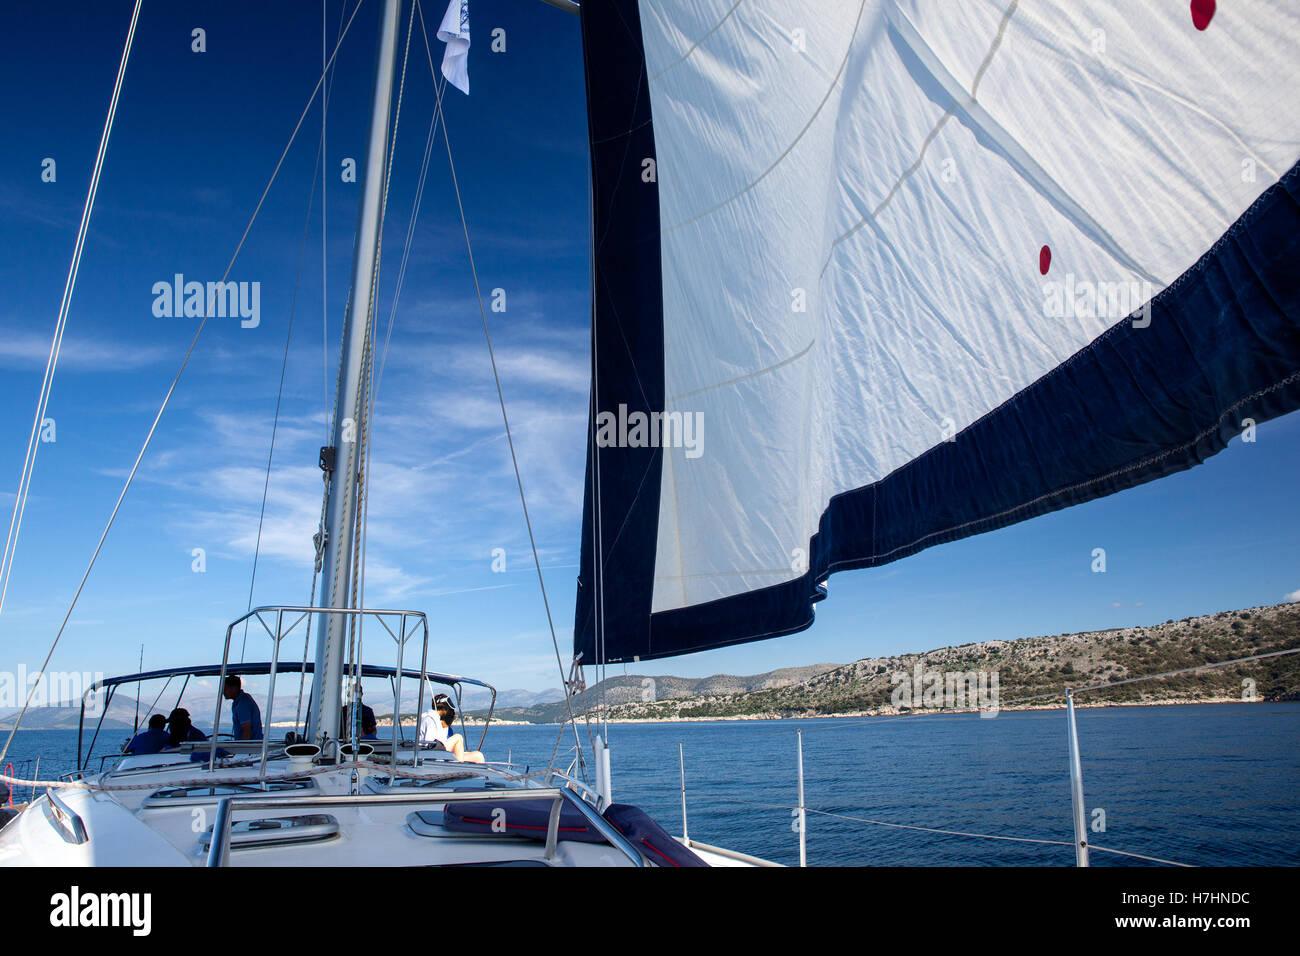 Yacht, regata a vela. Immagini Stock